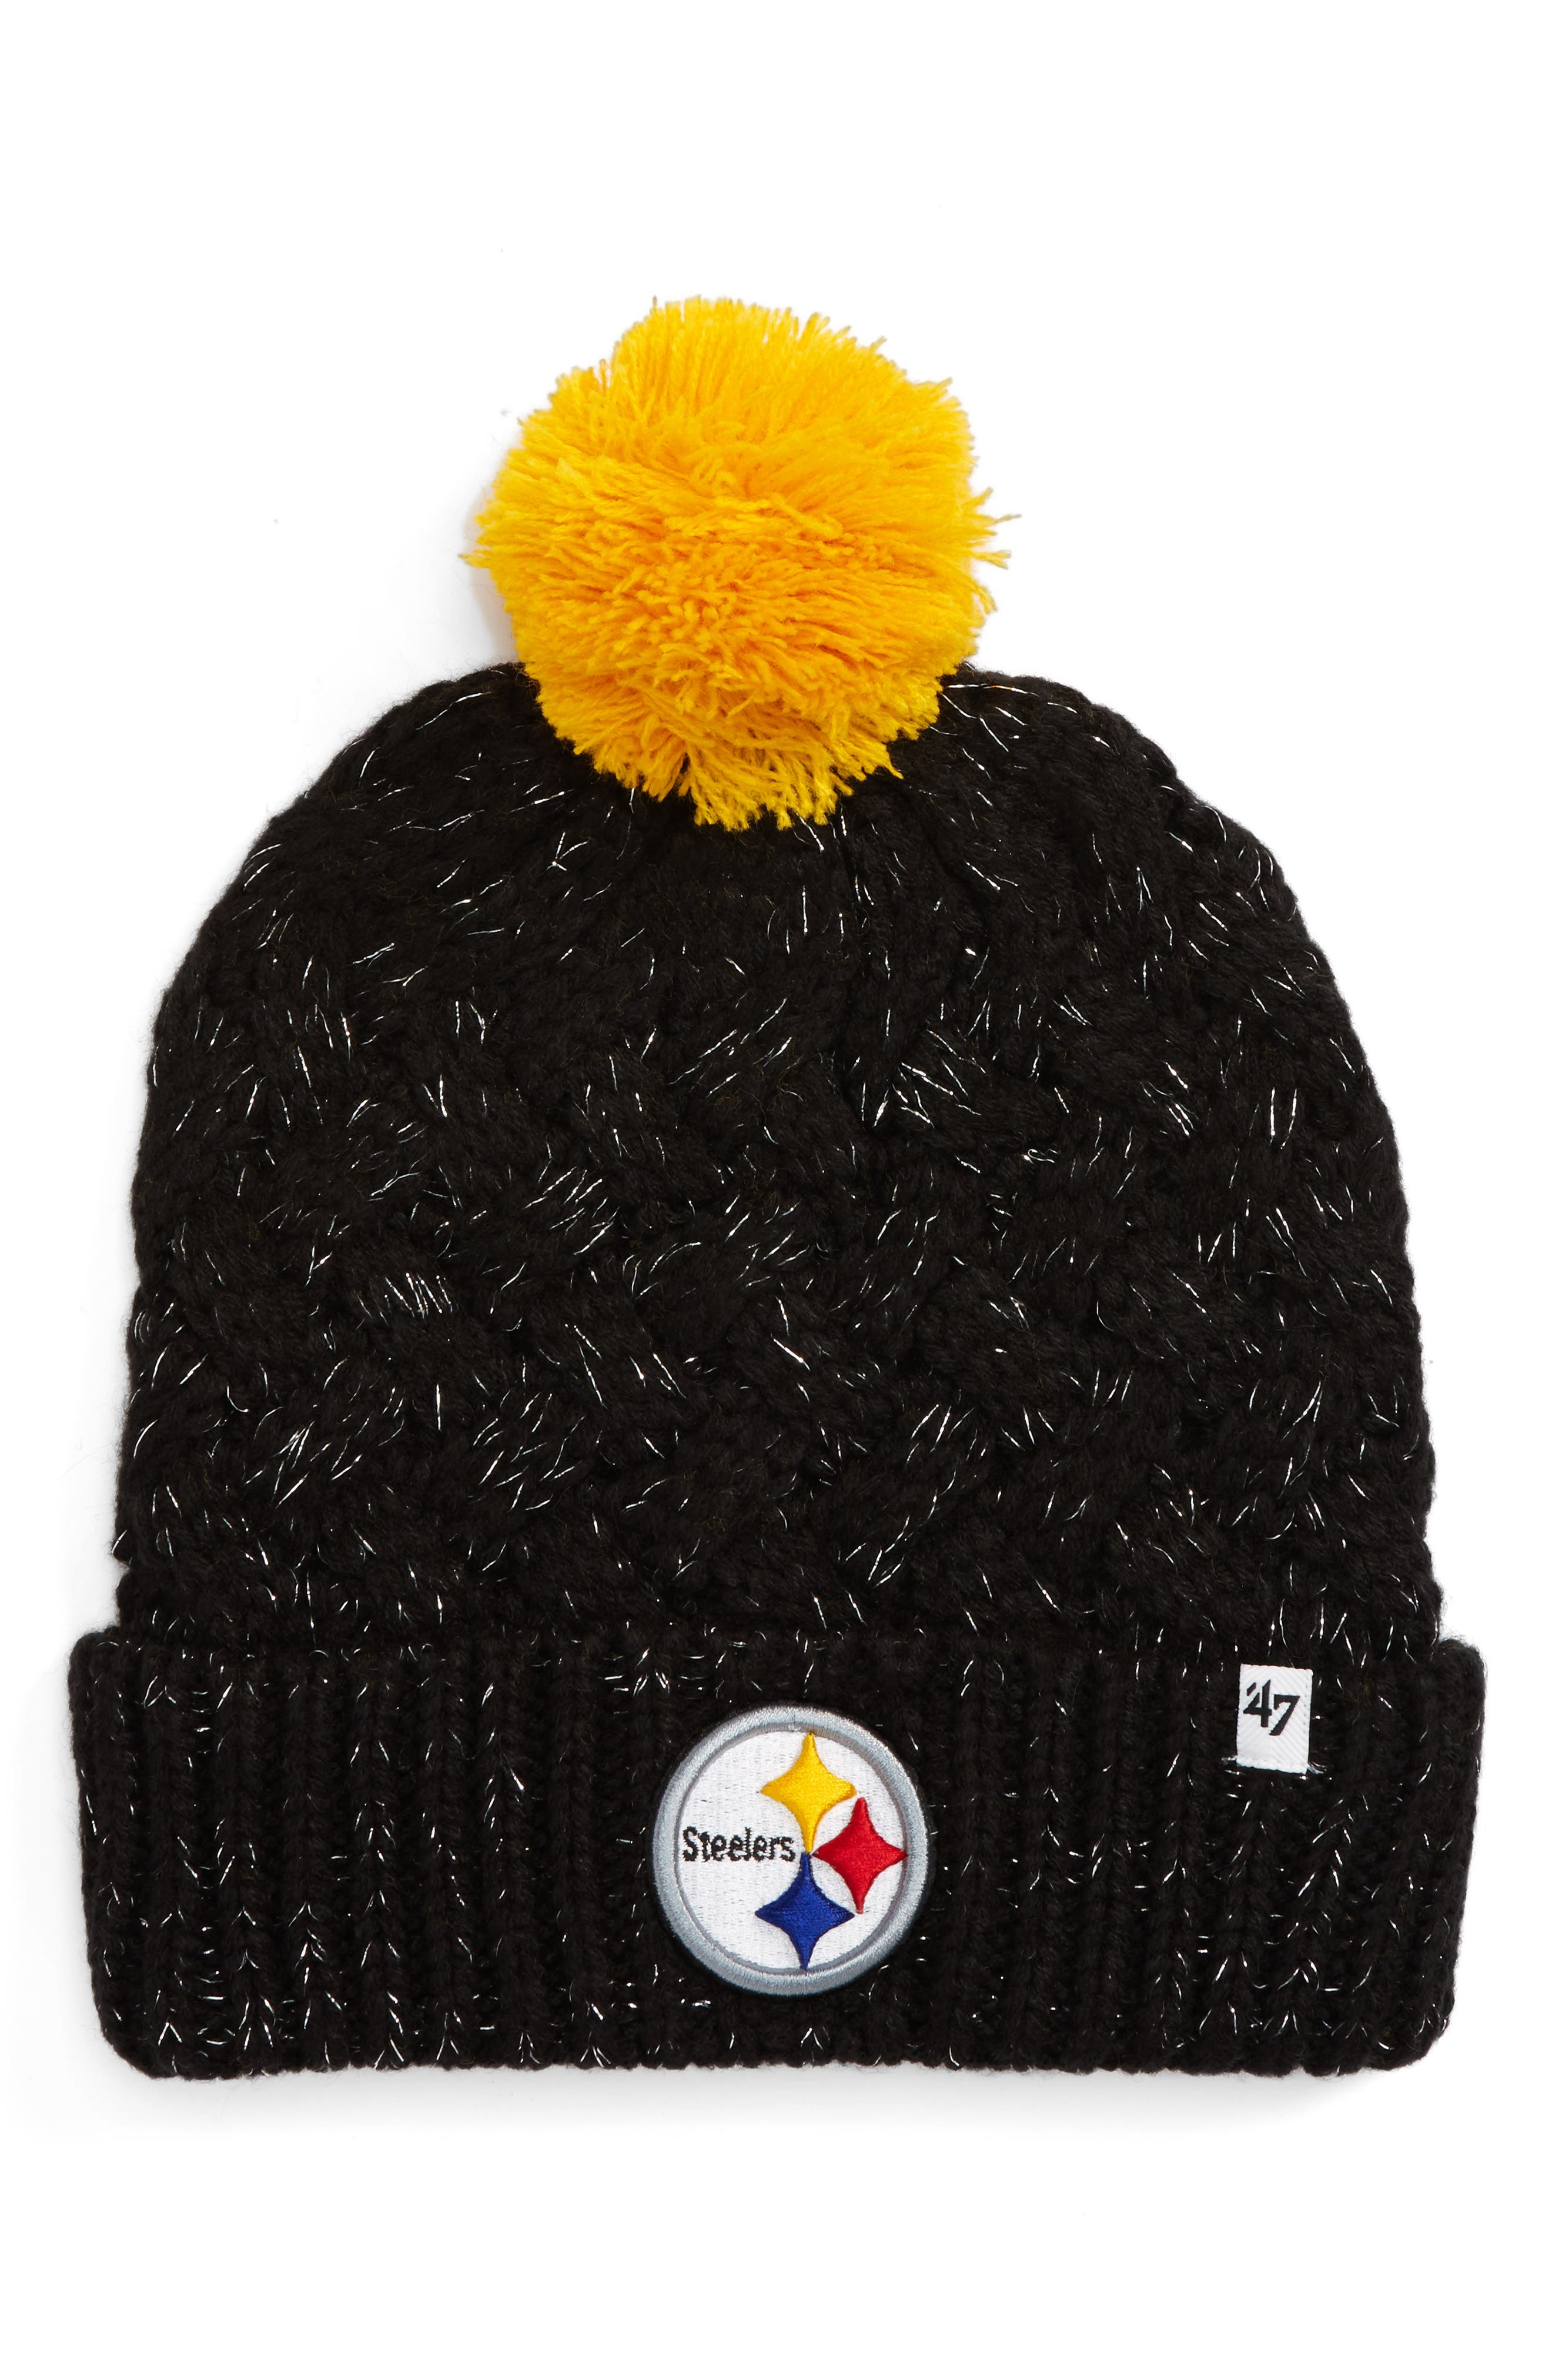 Main Image - '47 Fiona Pittsburgh Steelers Pom Beanie